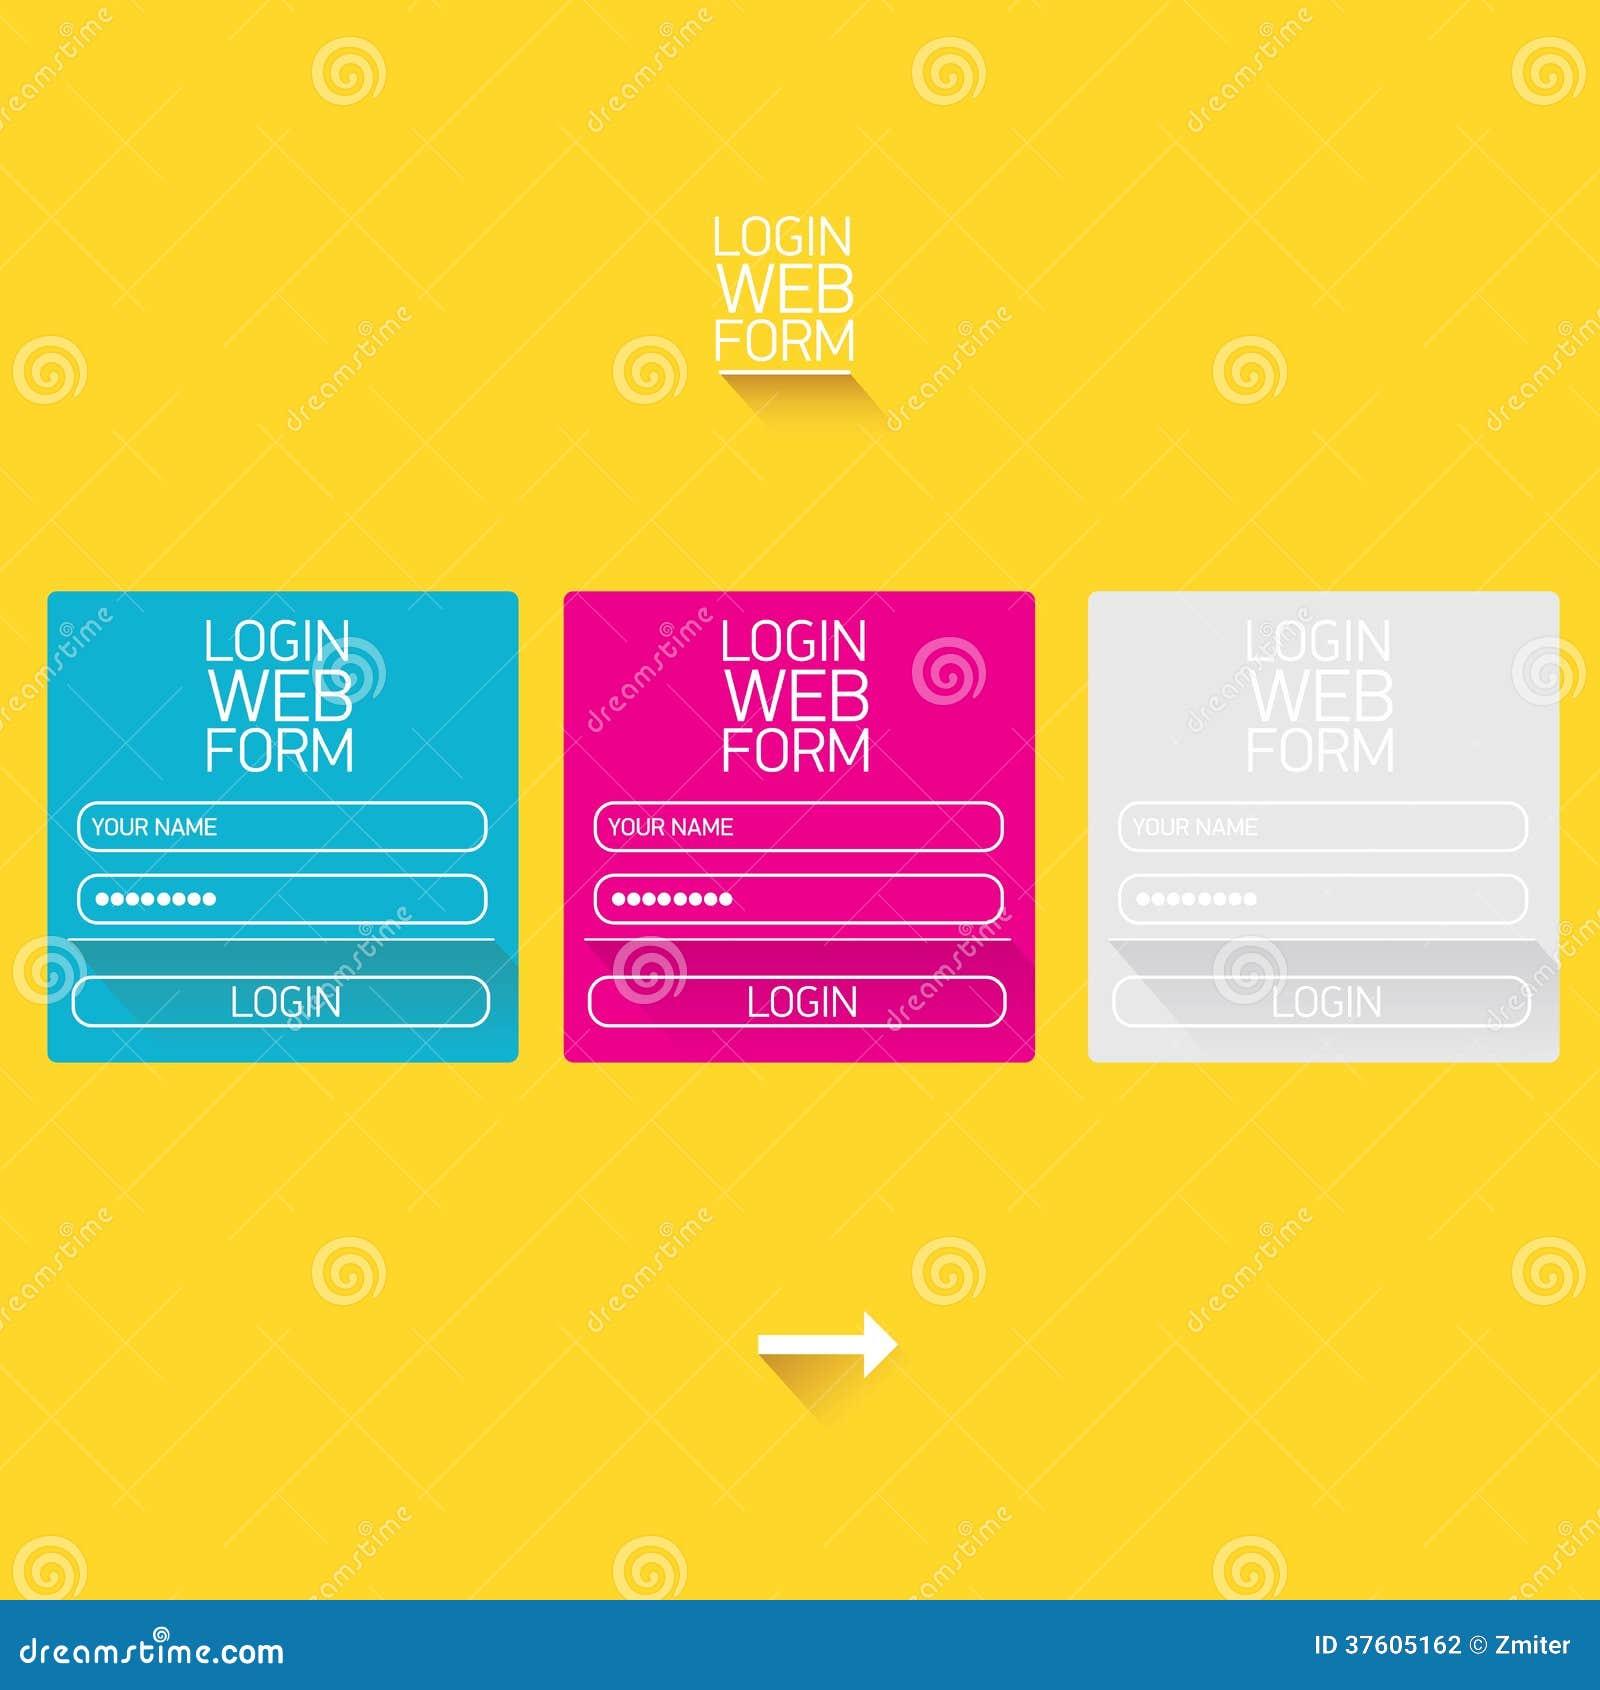 vector login website template flat design stock photography image 37605162. Black Bedroom Furniture Sets. Home Design Ideas